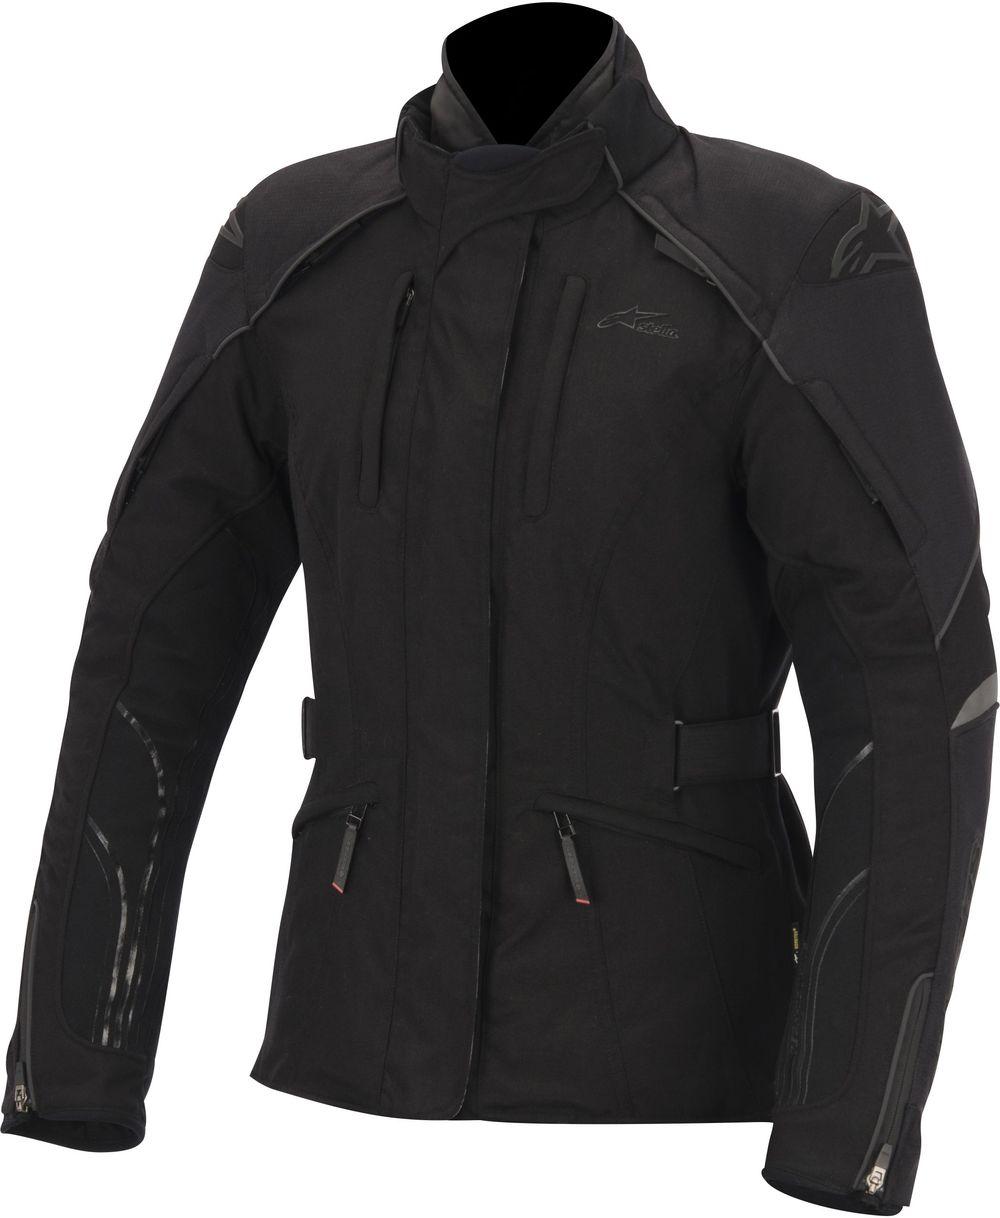 alpinestars_new_land_gtx_jacket_black_front